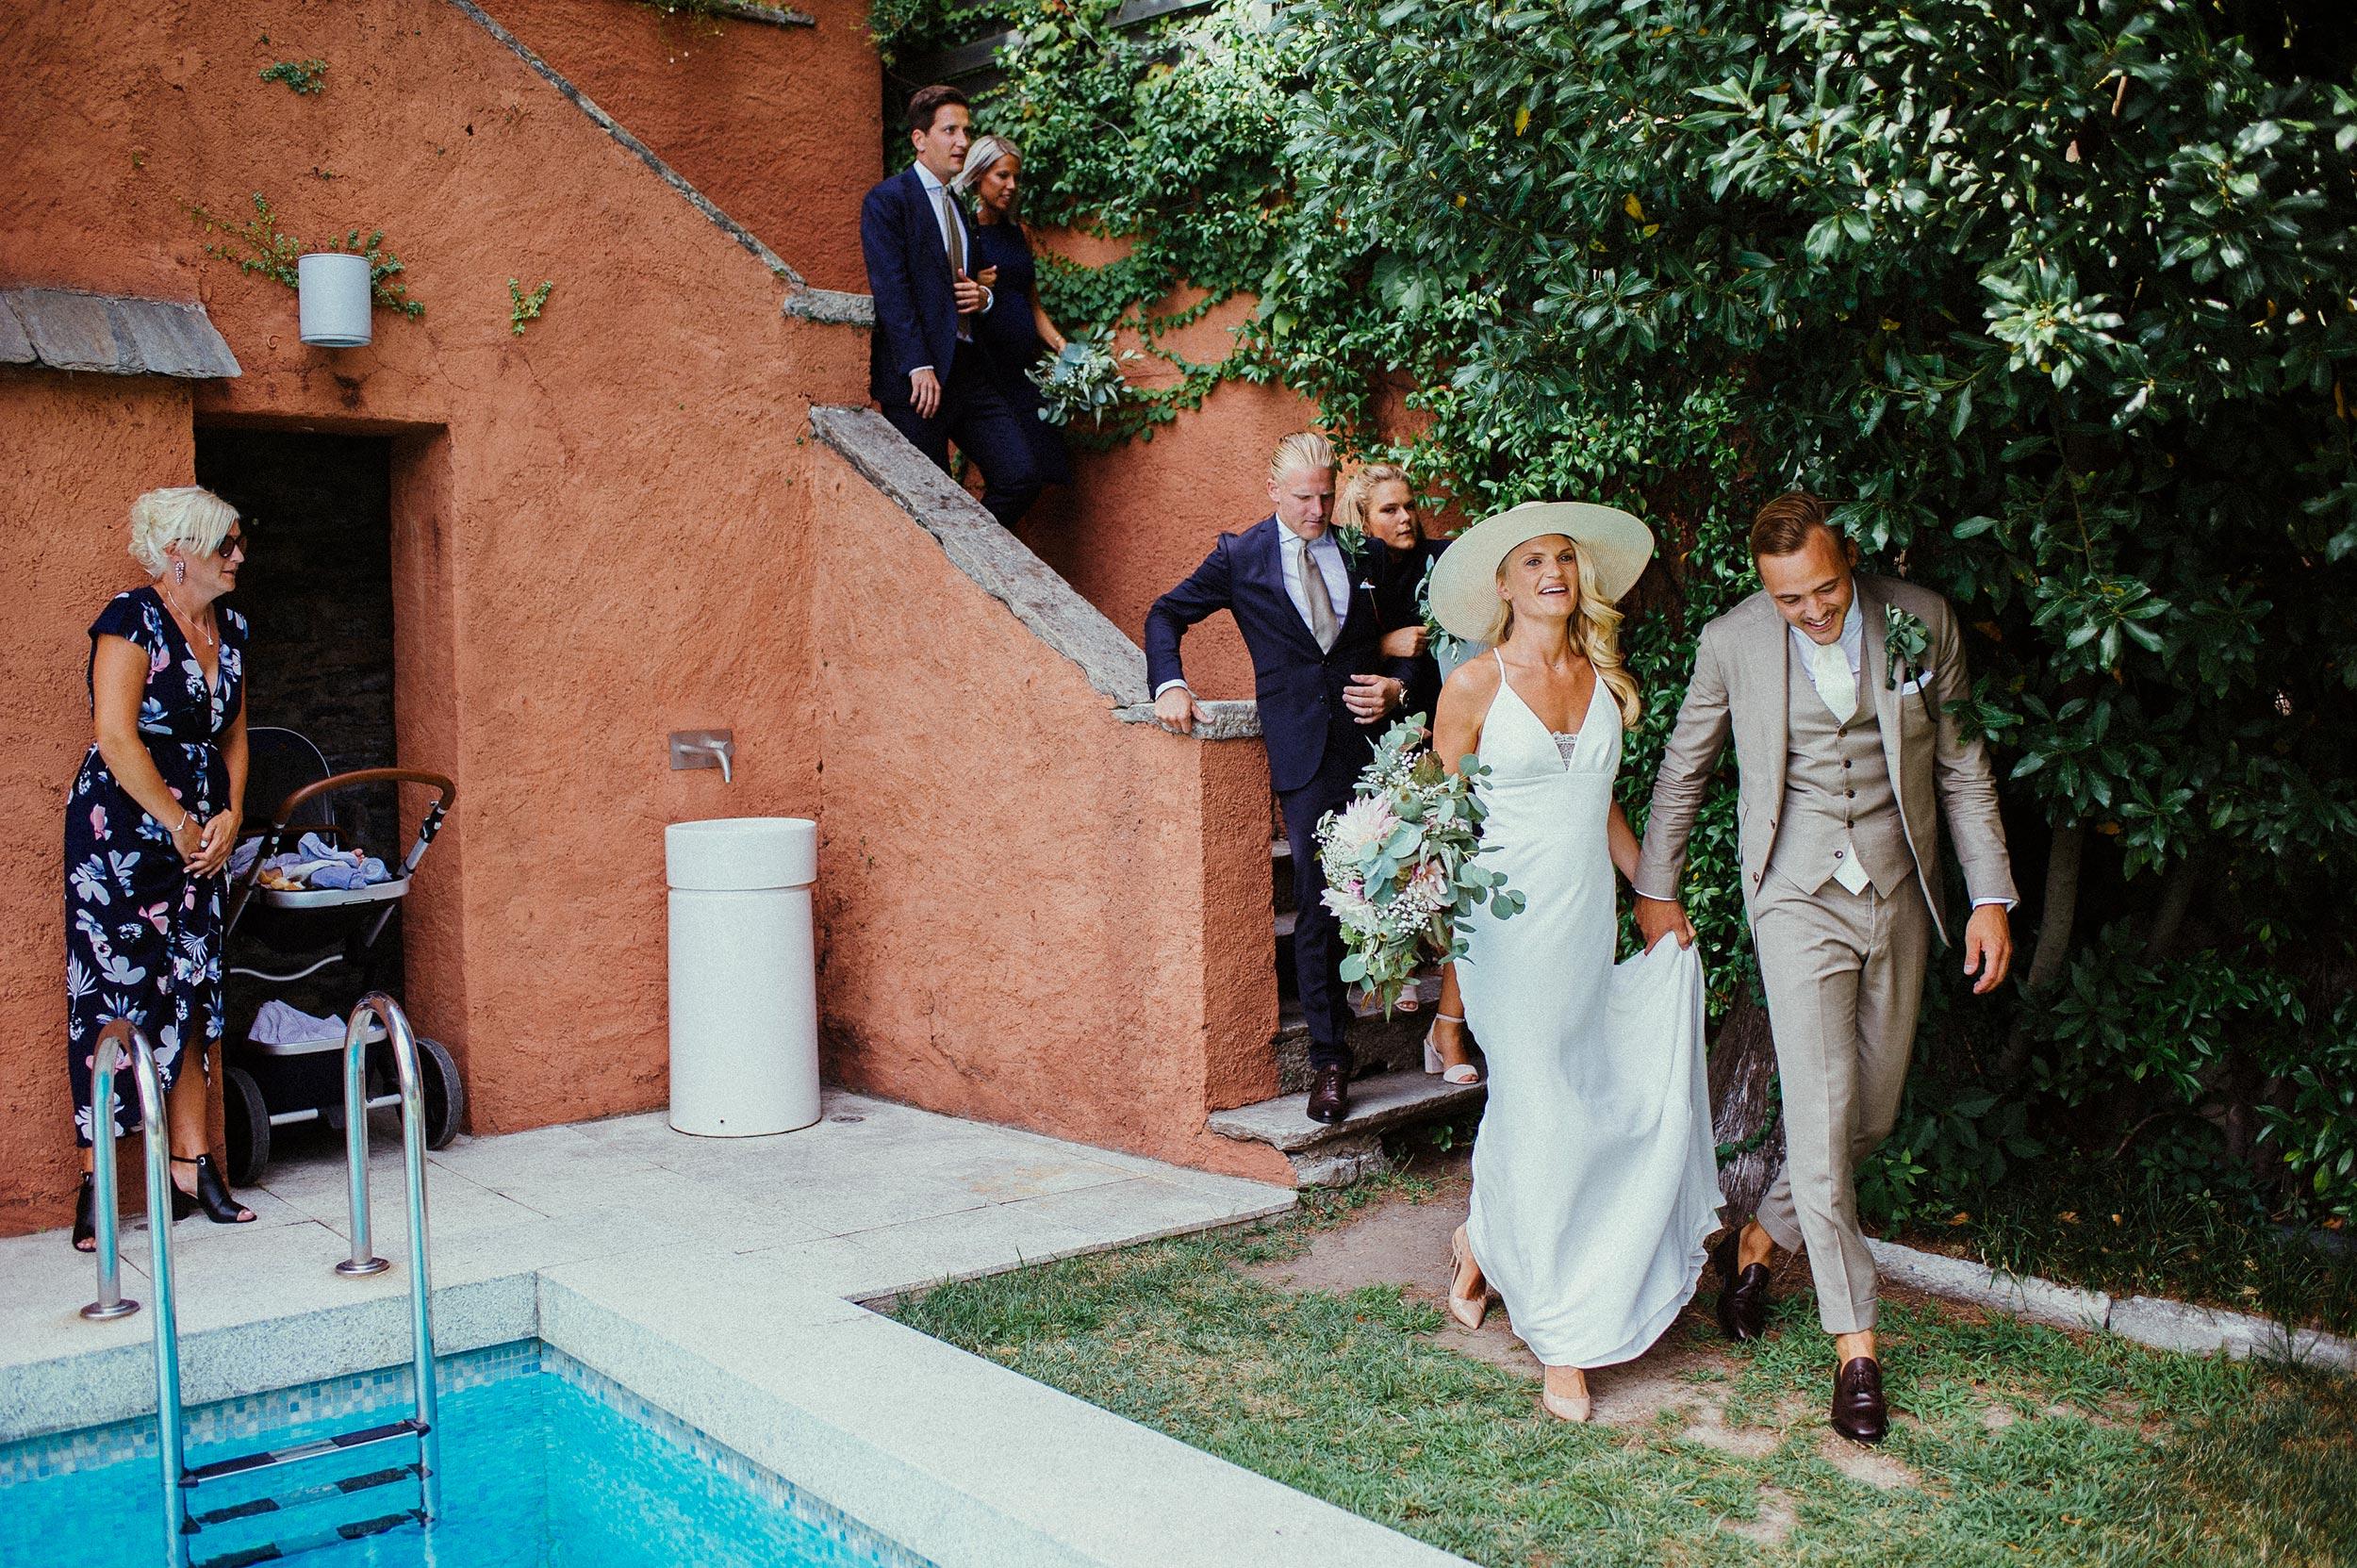 2018-Villa-Regina-Teodolinda-Lake-Como-Wedding-Photographer-Italy-Alessandro-Avenali-164.jpg